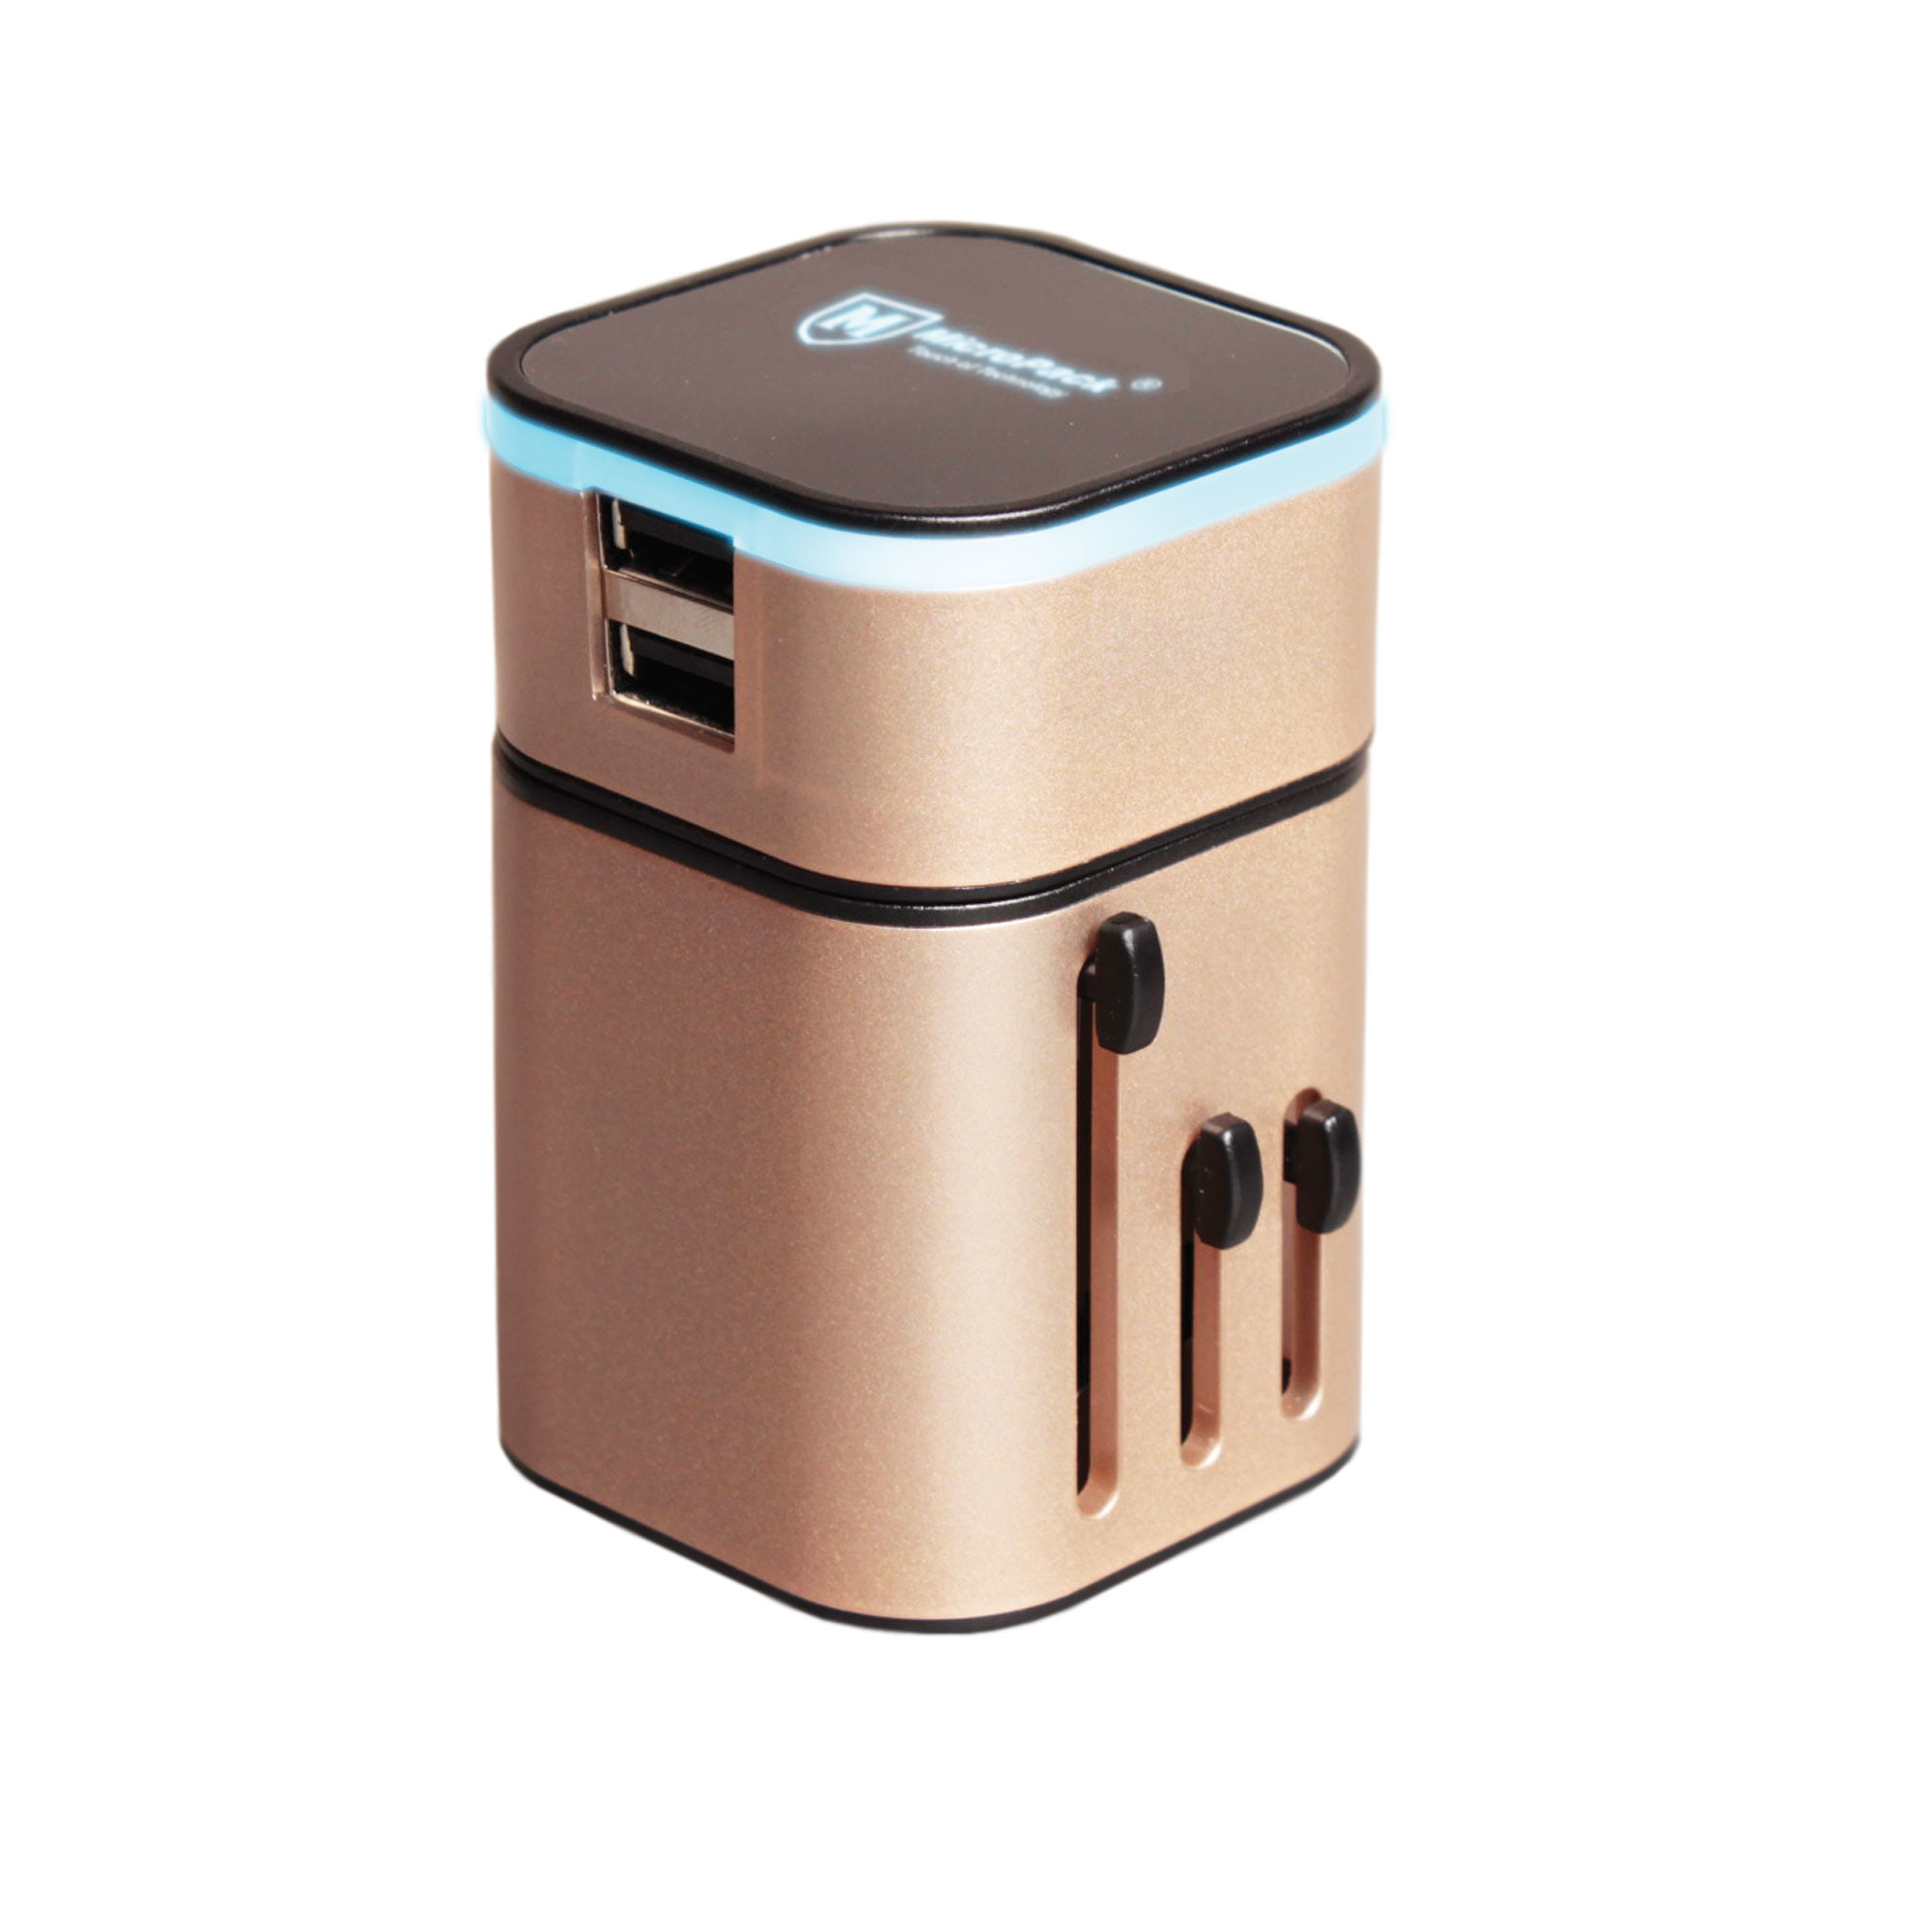 Travel Micropack Tc - 232 Adapter 2 Usb Cherger 3.2a - Blanja.com